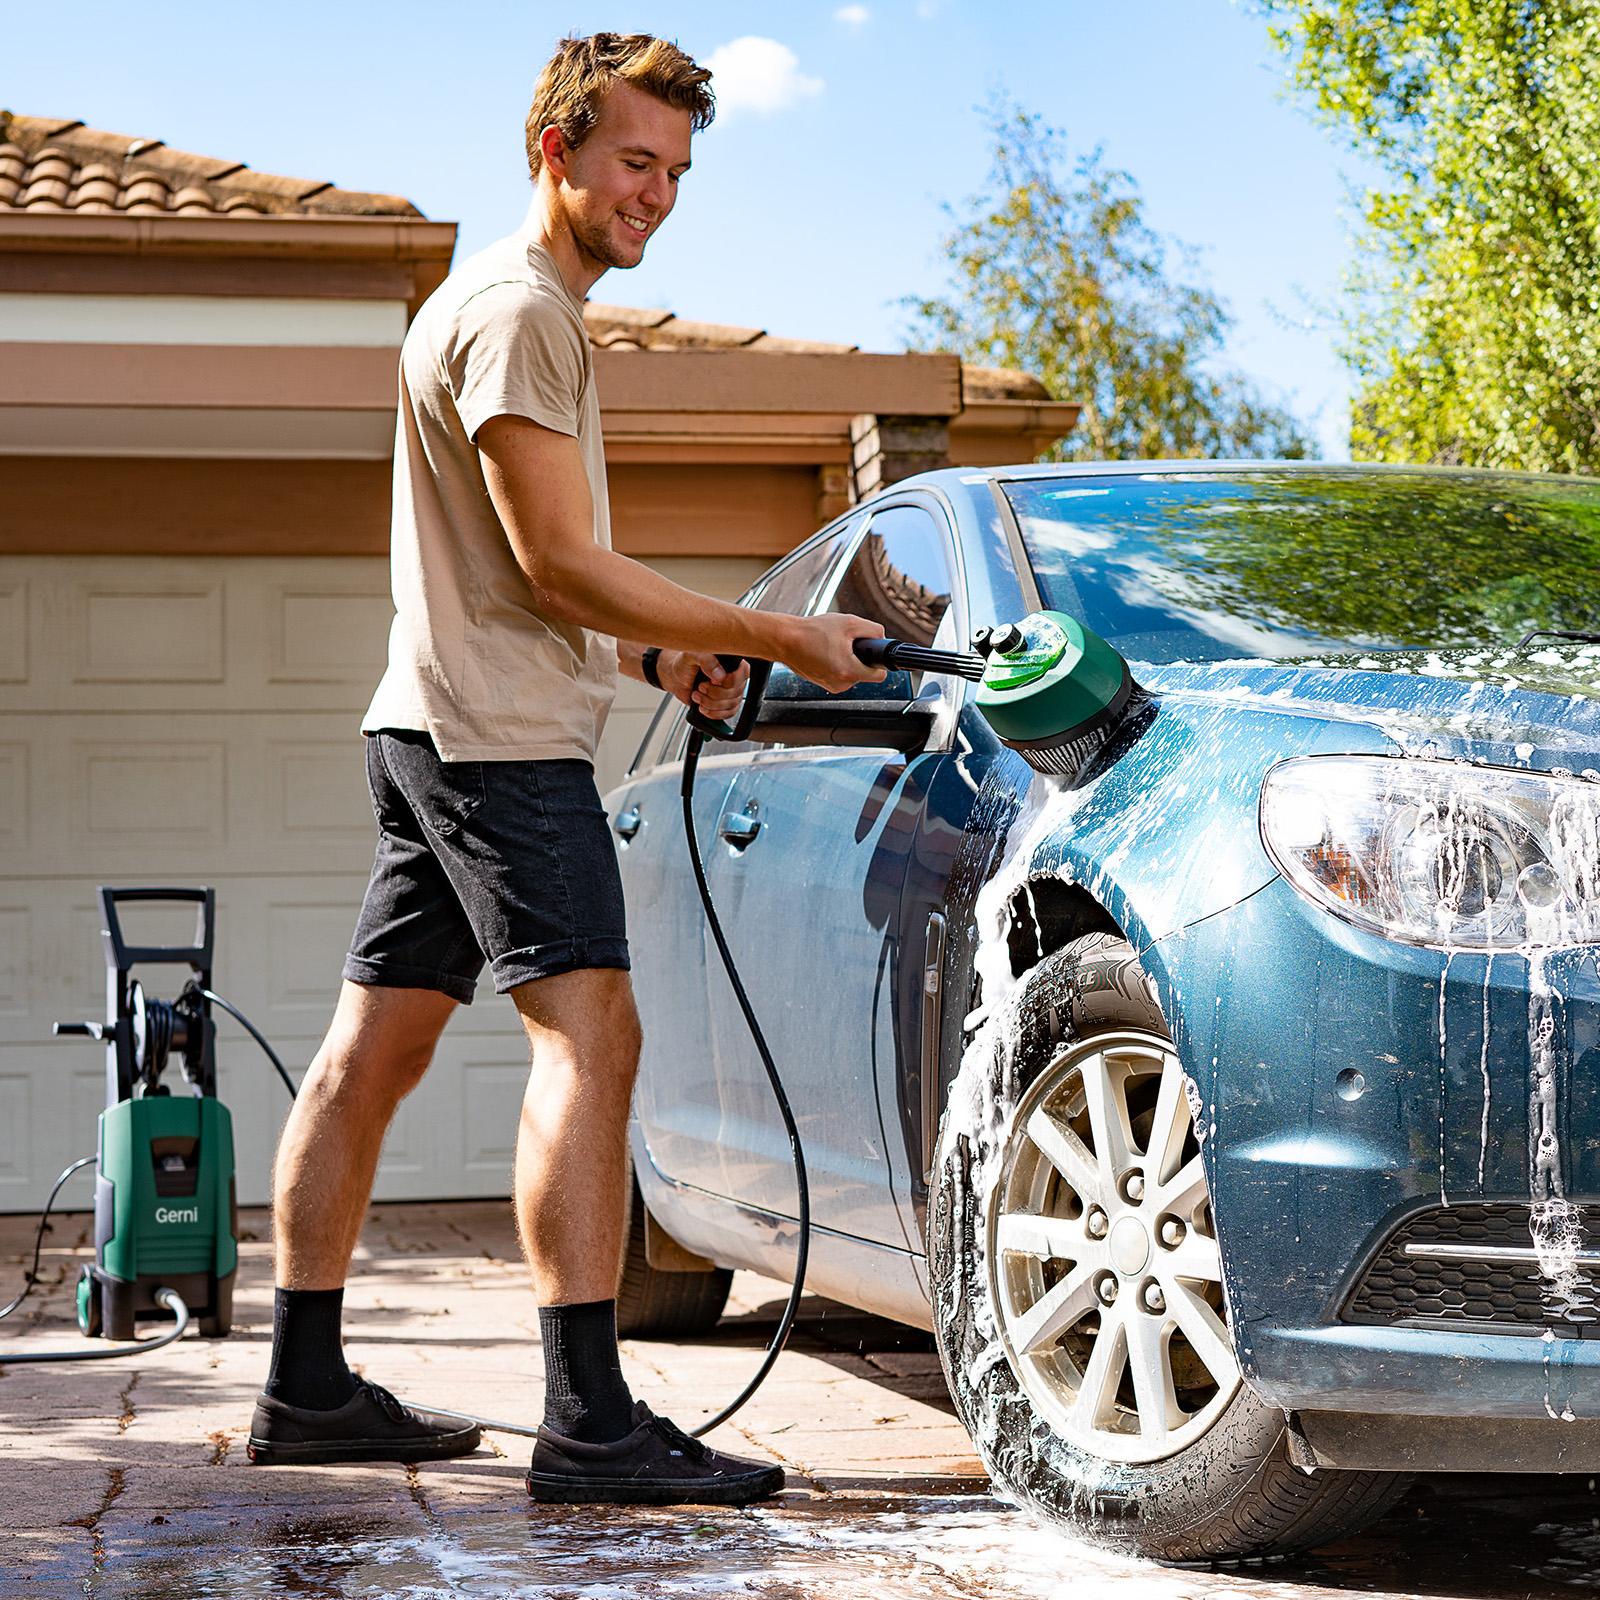 Gerni Rotary Detergent Brush - Car Sedan Commodore